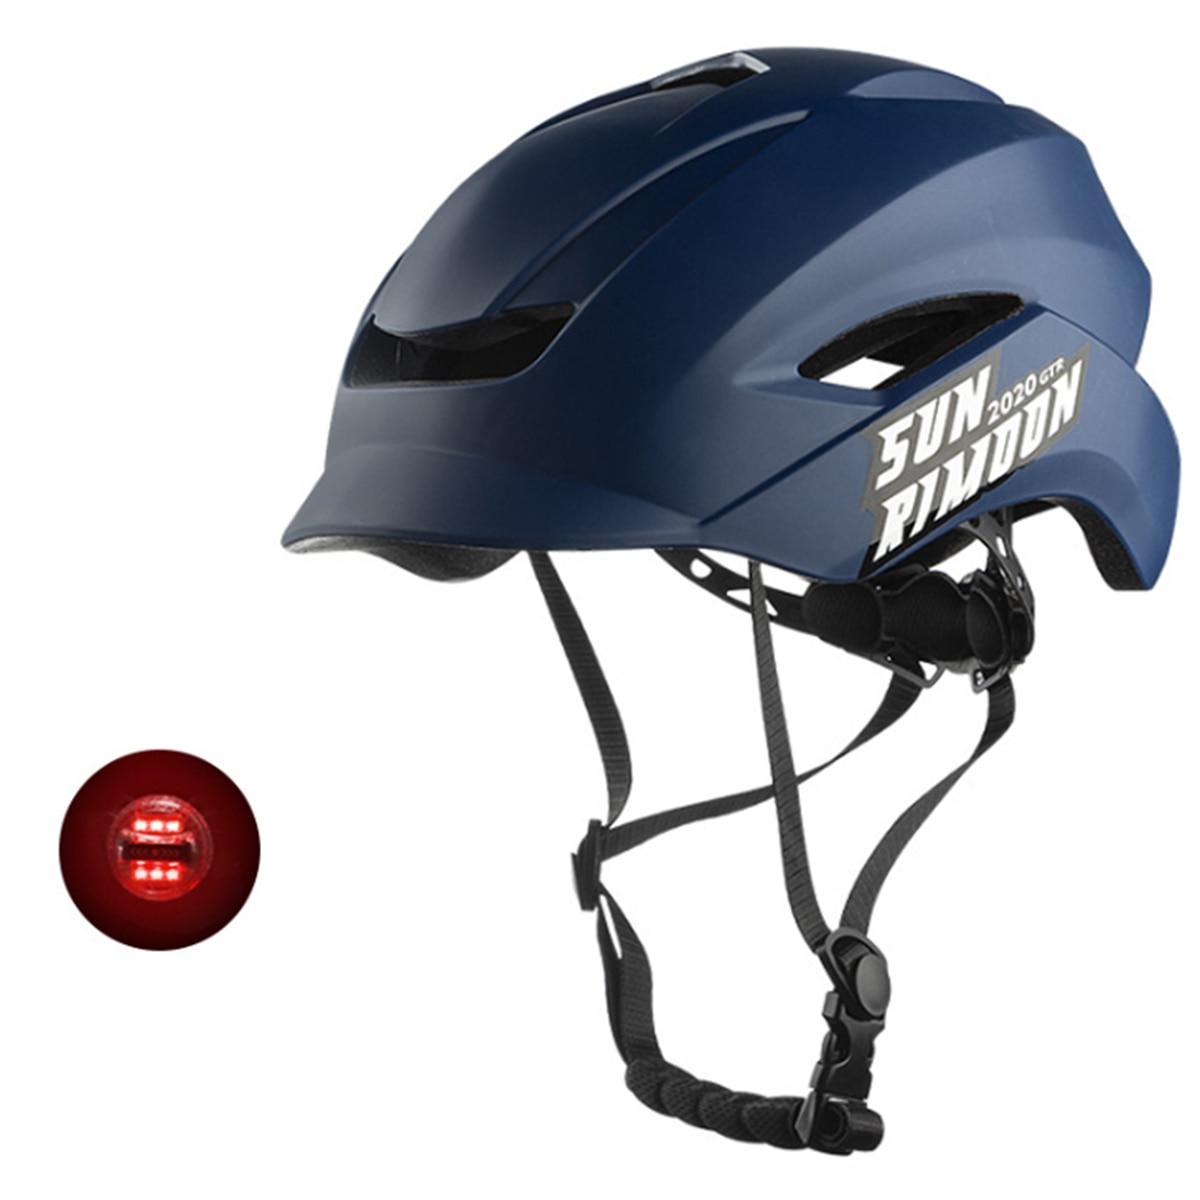 Big Sale Dfa3ad Gub City Pro Bike Helmets In Mold Cycling Light Men Women Helmet Mtb Bicycle Helmet Goggles Safe Arrival Matte Color Unisex Cicig Co